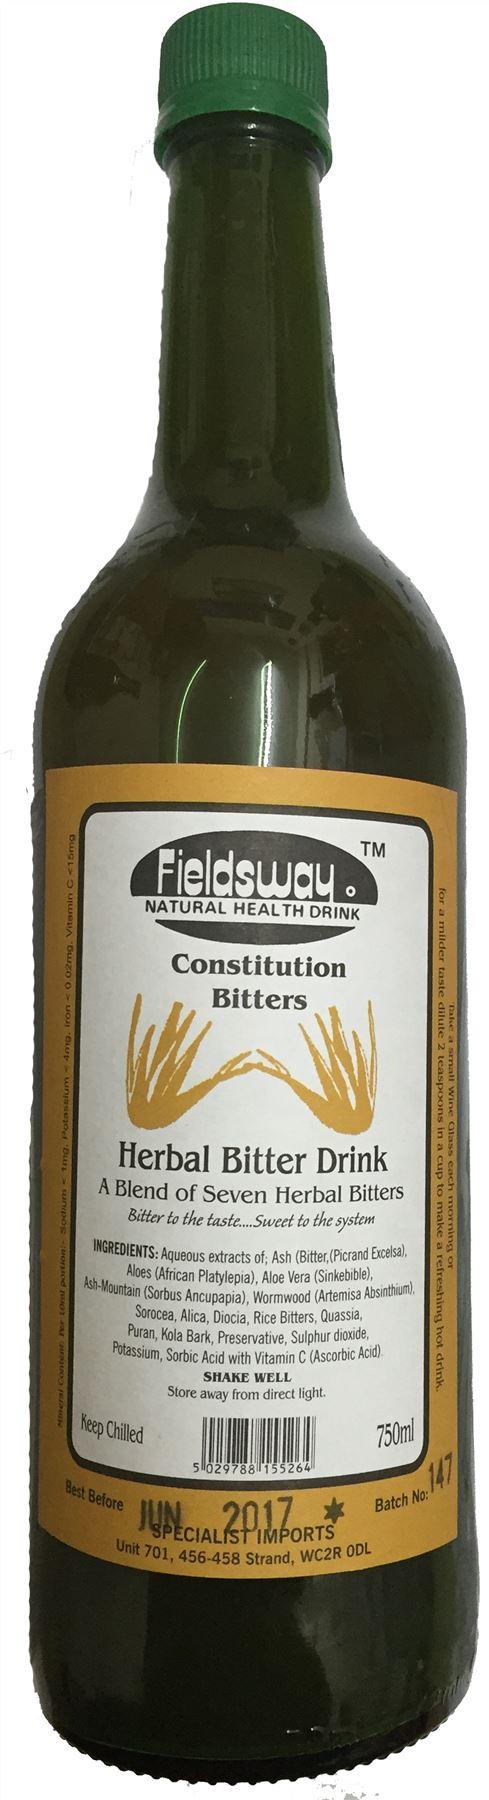 Fieldsway Constitute Bitters Herbal Bitter Drink 750ml   eBay